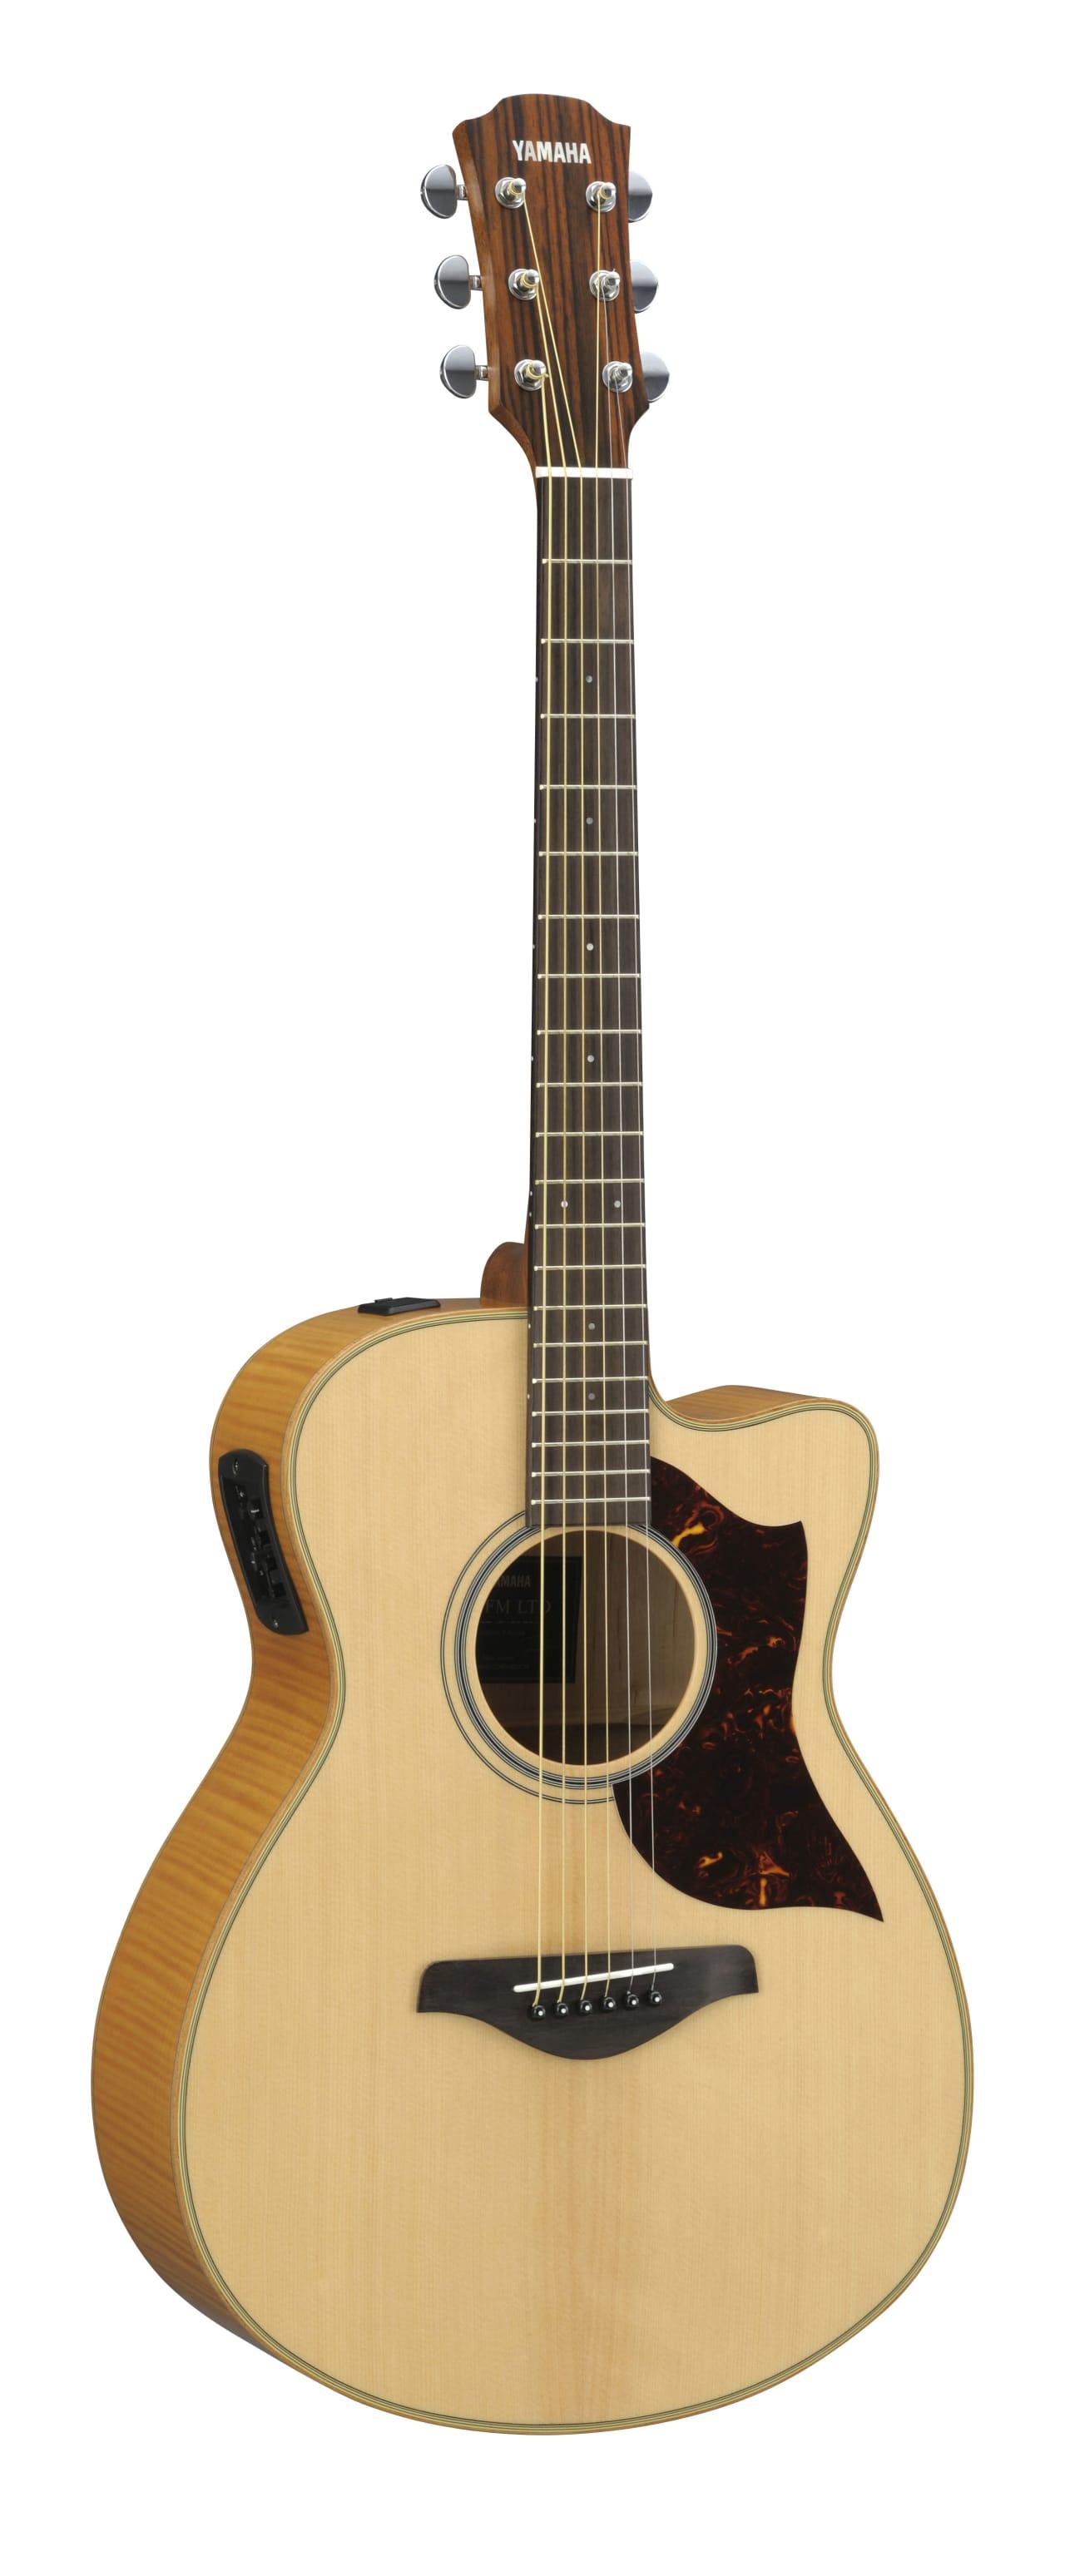 Yamaha ac1 flame maple acoustic electric guitar w hard for Yamaha fg830 specs